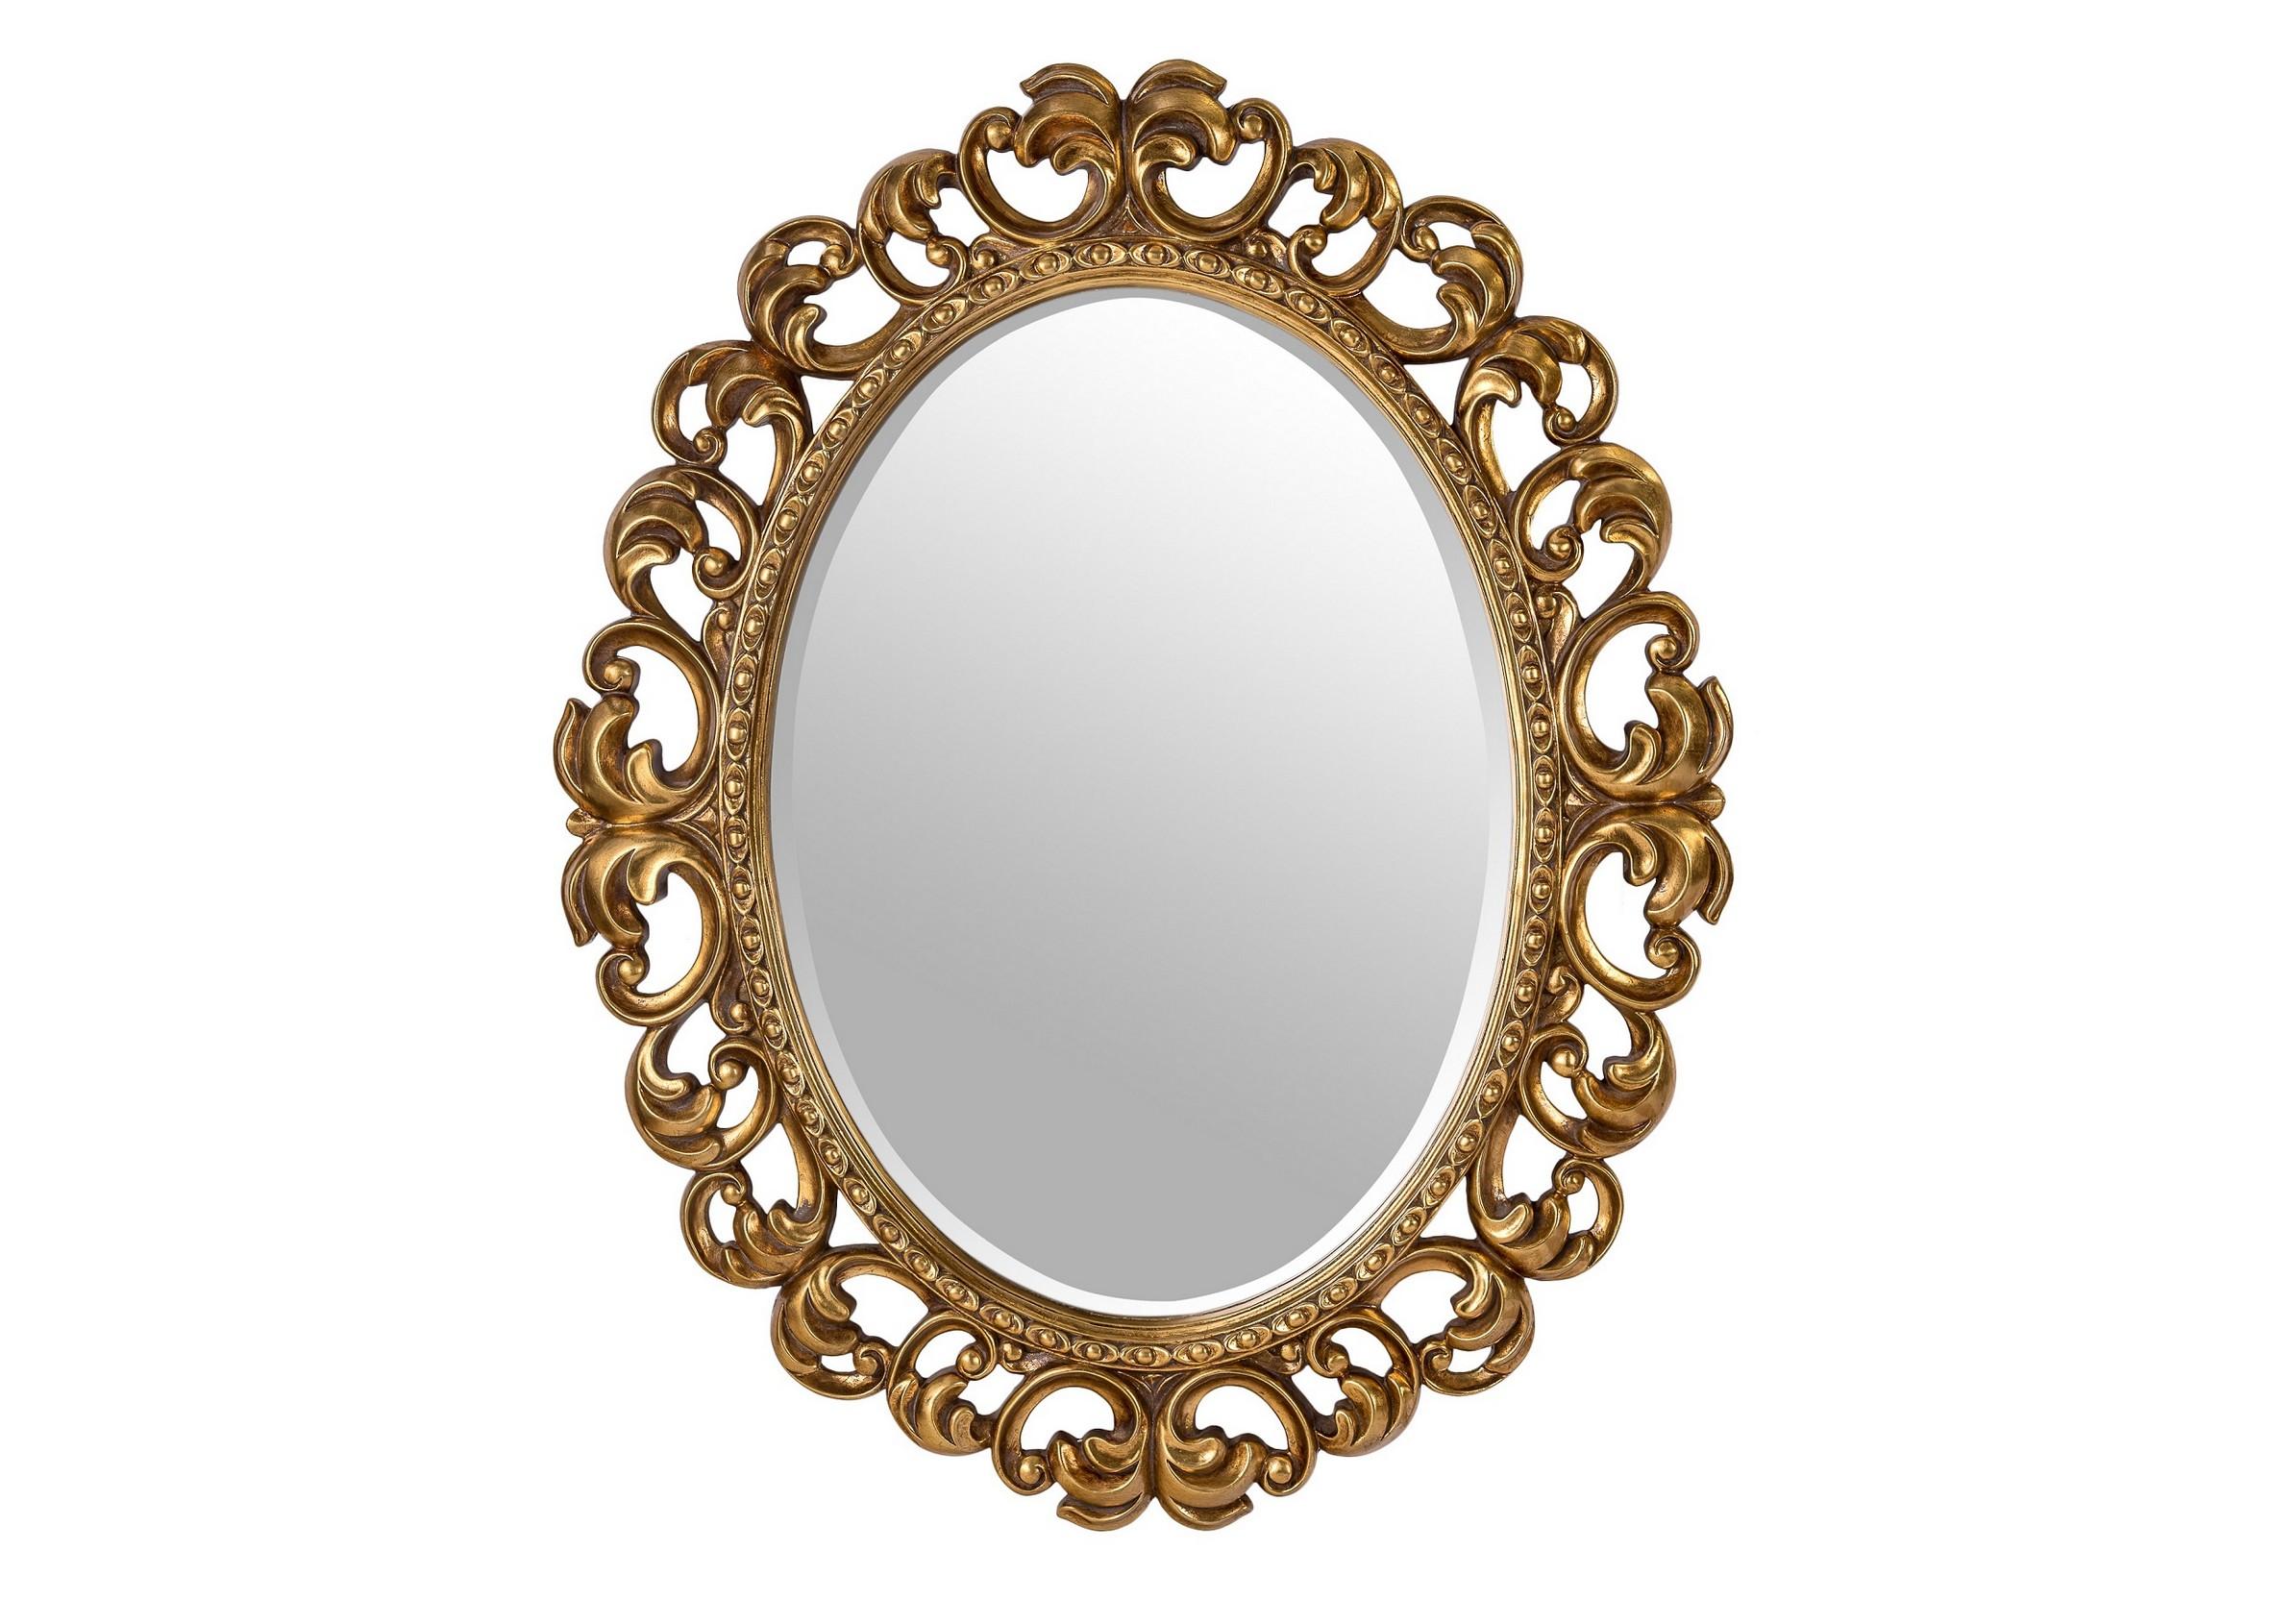 Зеркало Daisy GoldНастенные зеркала<br>Цвет: античное золото<br><br>Material: Пластик<br>Length см: None<br>Width см: 80.0<br>Depth см: None<br>Height см: 100.0<br>Diameter см: None